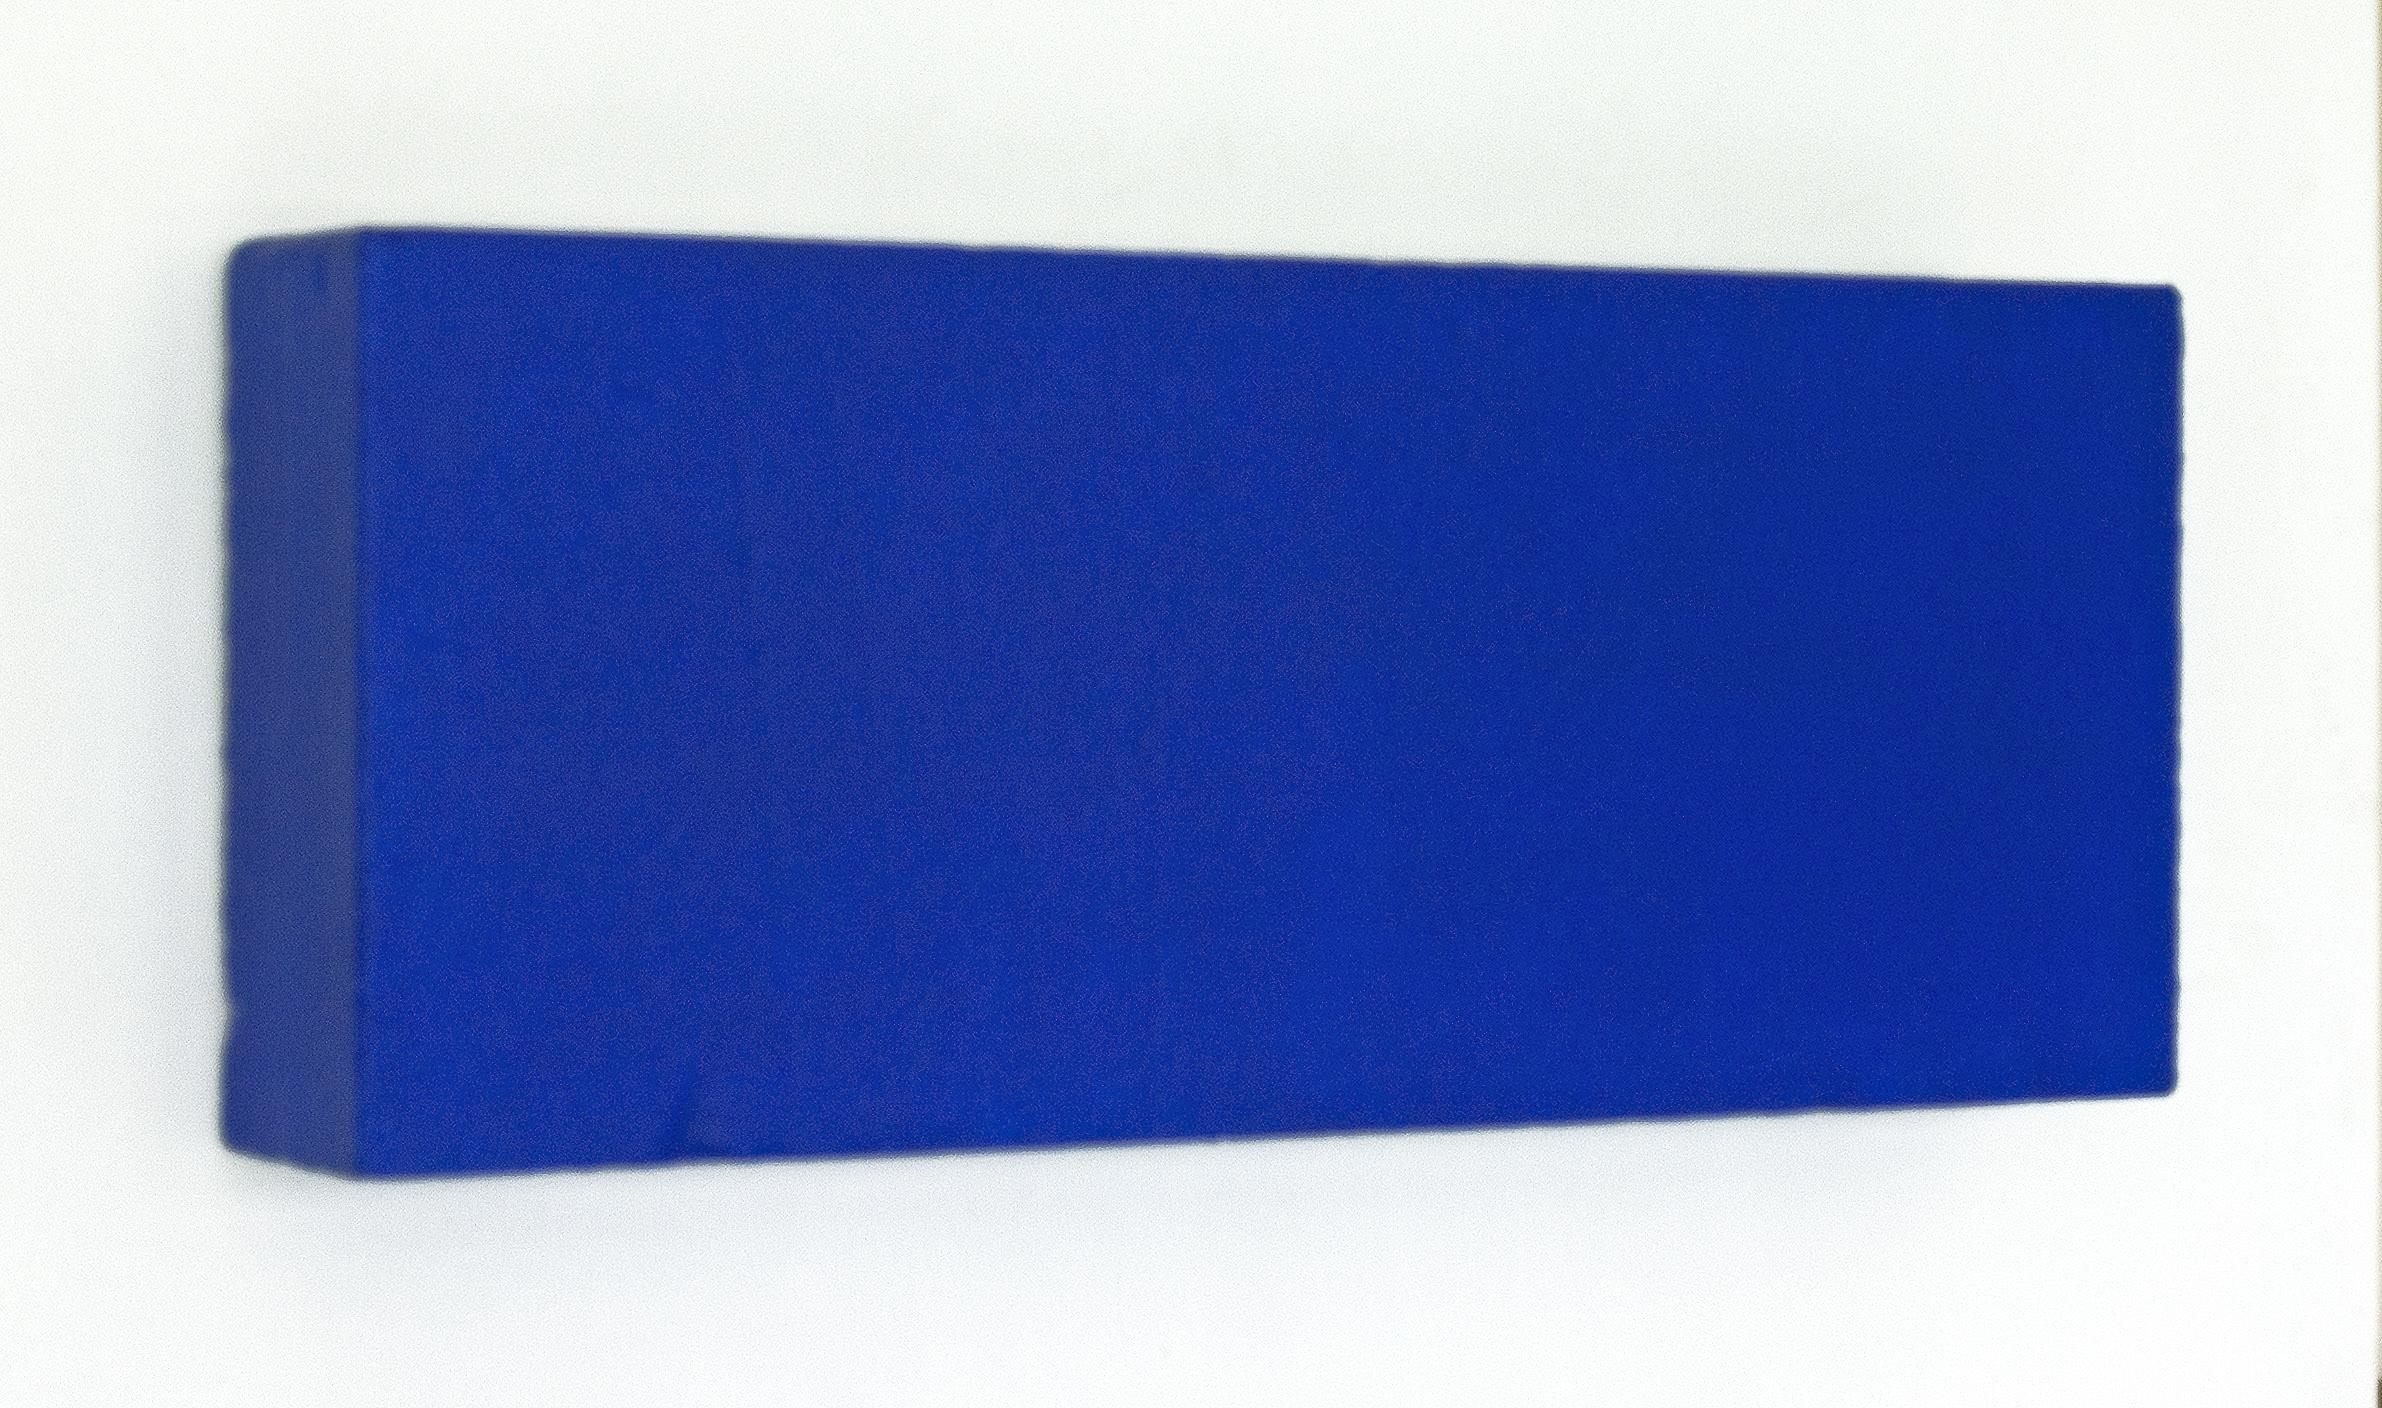 POMEN, akril, tekstil, siporeks, 25 x 60 cm, 2000